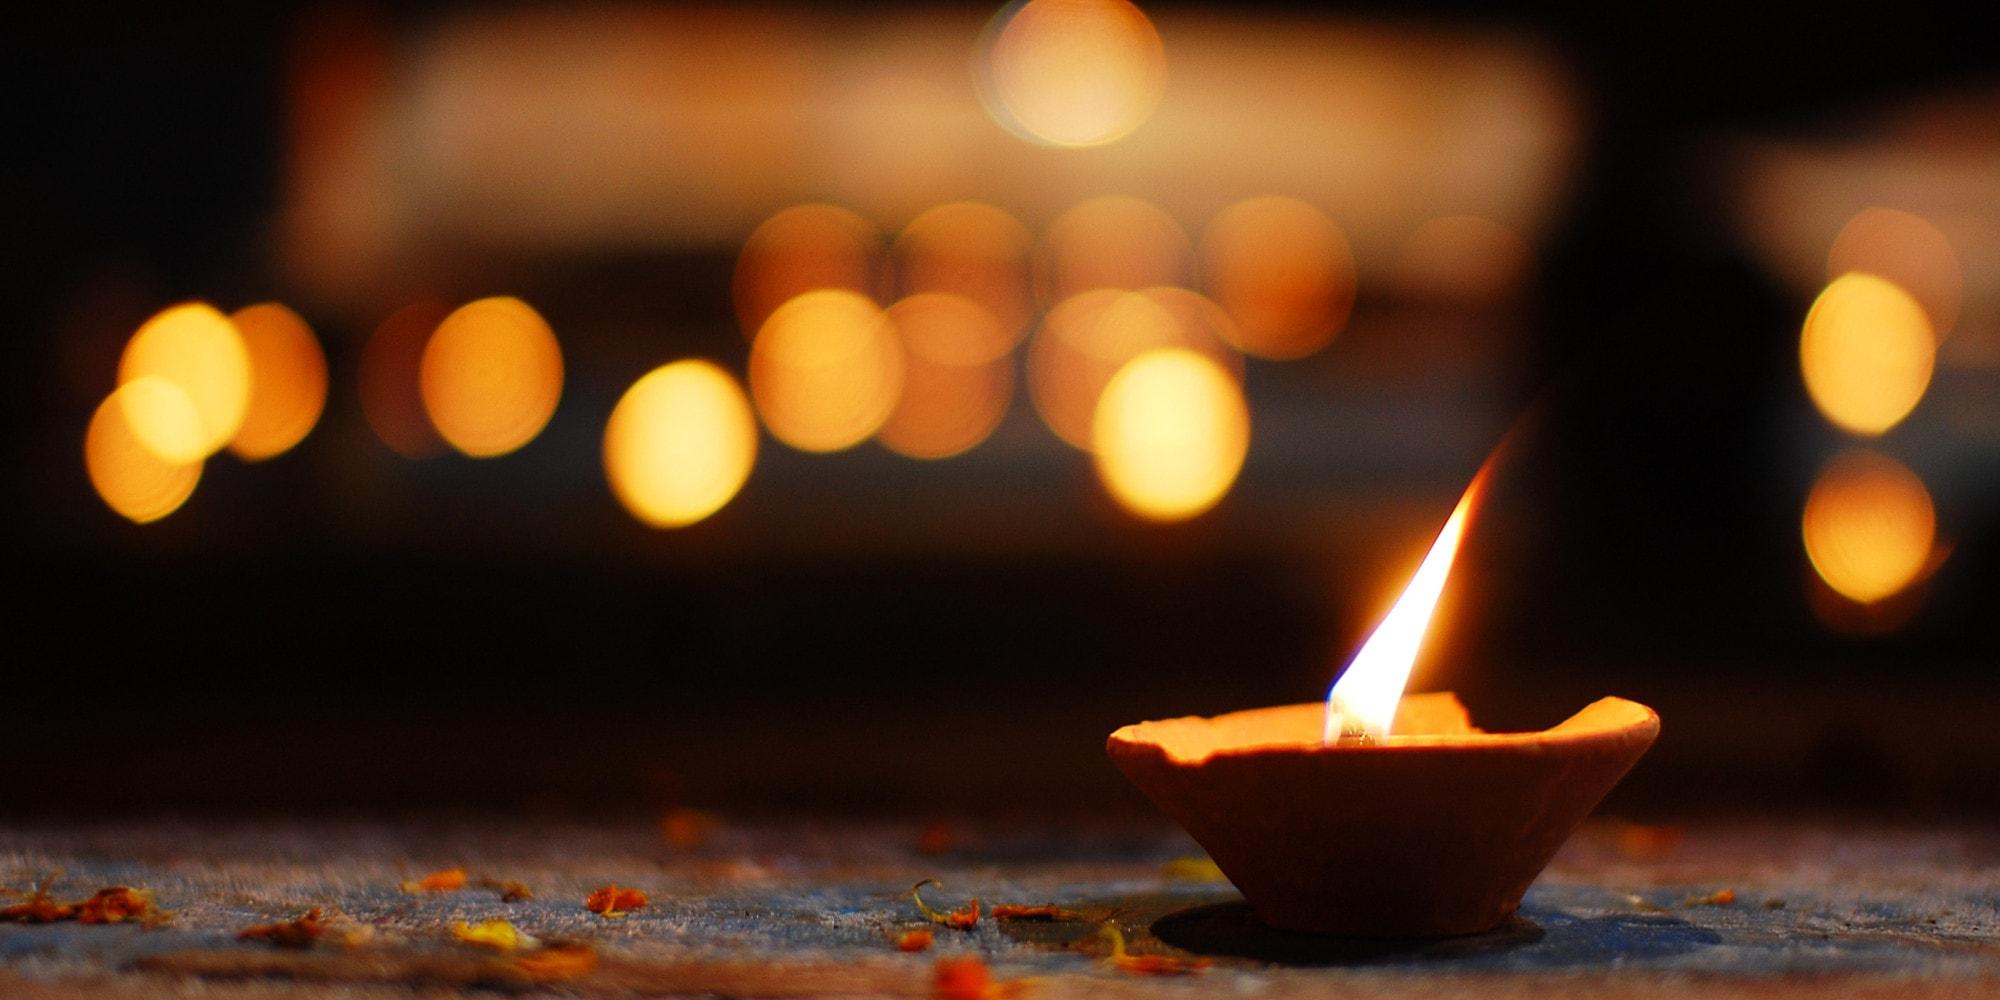 single diwali candle. blurred lights in background.jpg